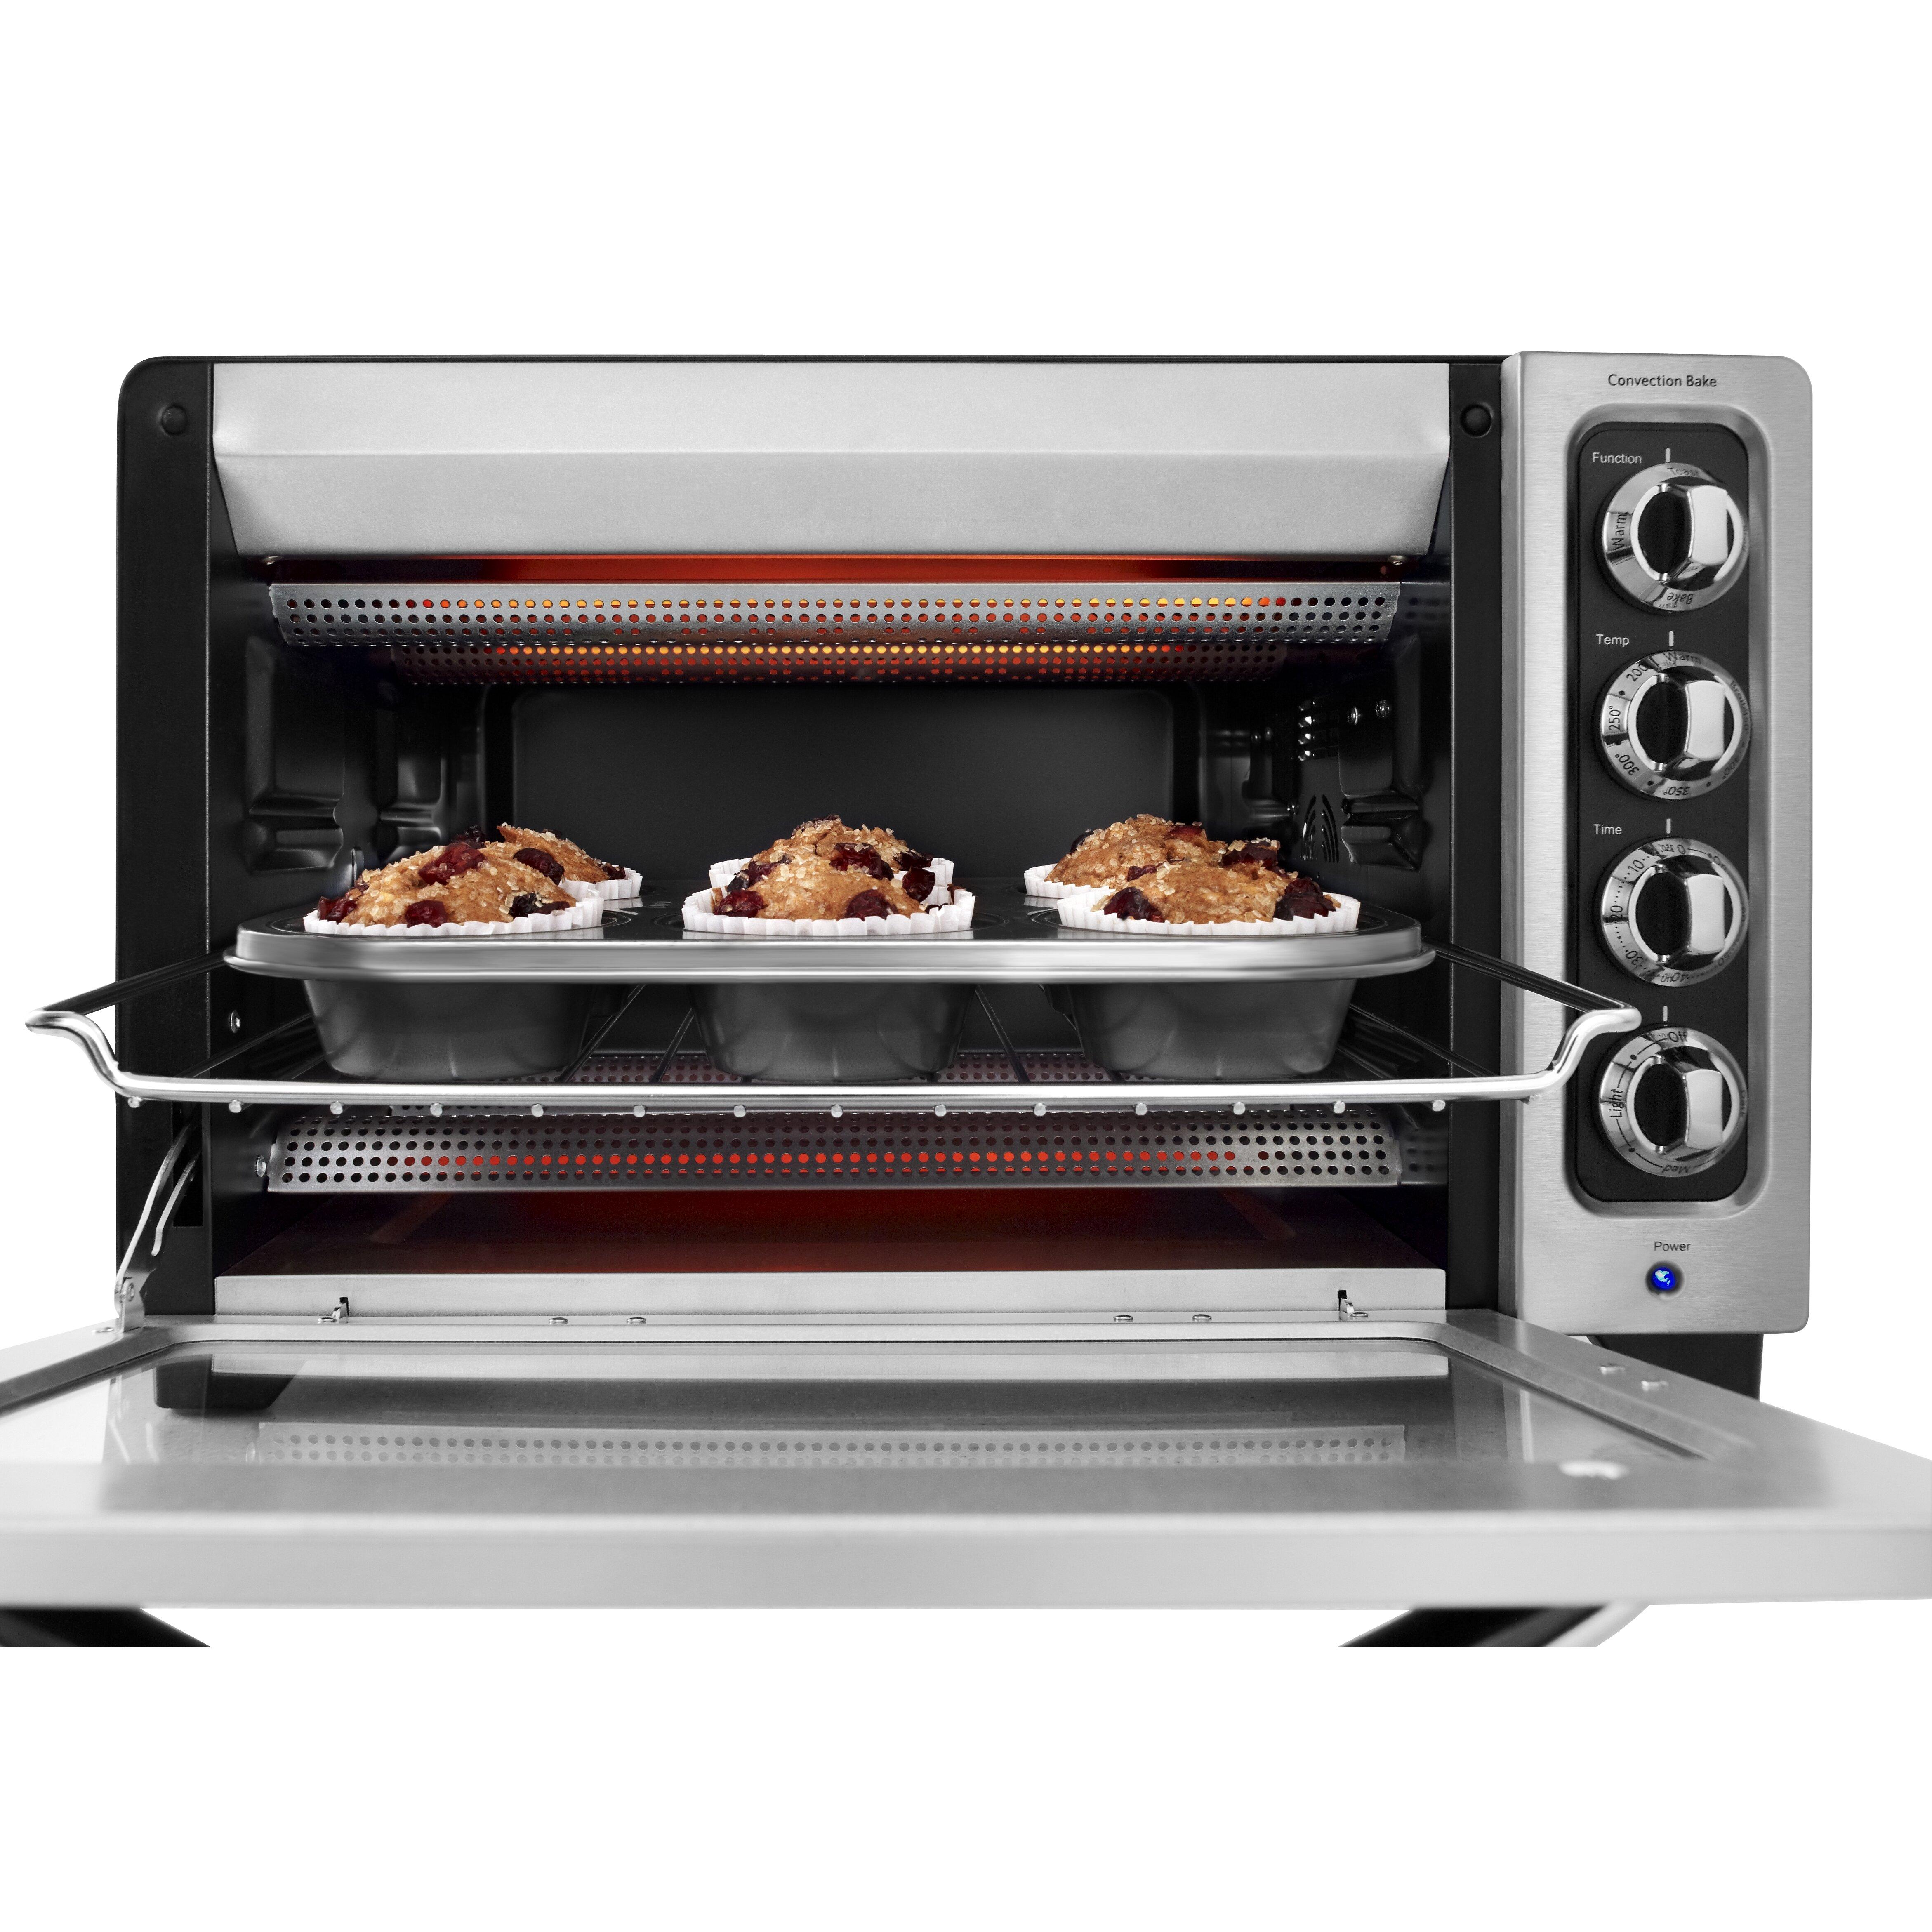 Countertop Stove Reviews : KitchenAid Countertop Toaster Oven & Reviews Wayfair